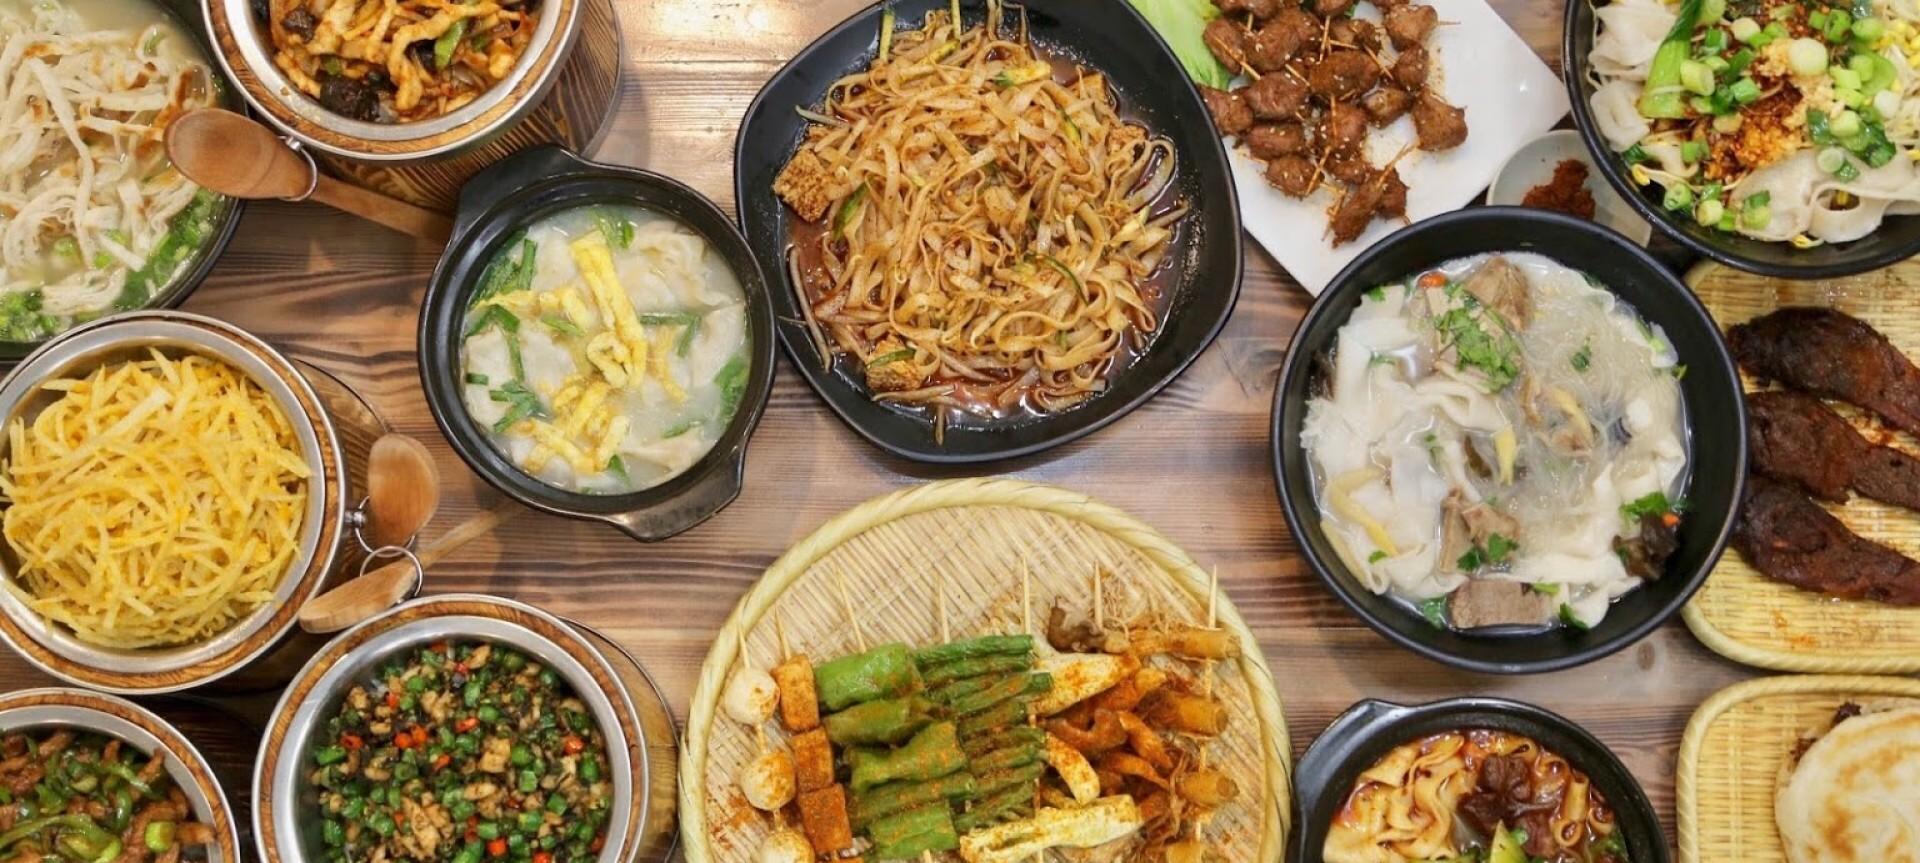 Miss Li Henan Cuisine Inc. 1号食堂